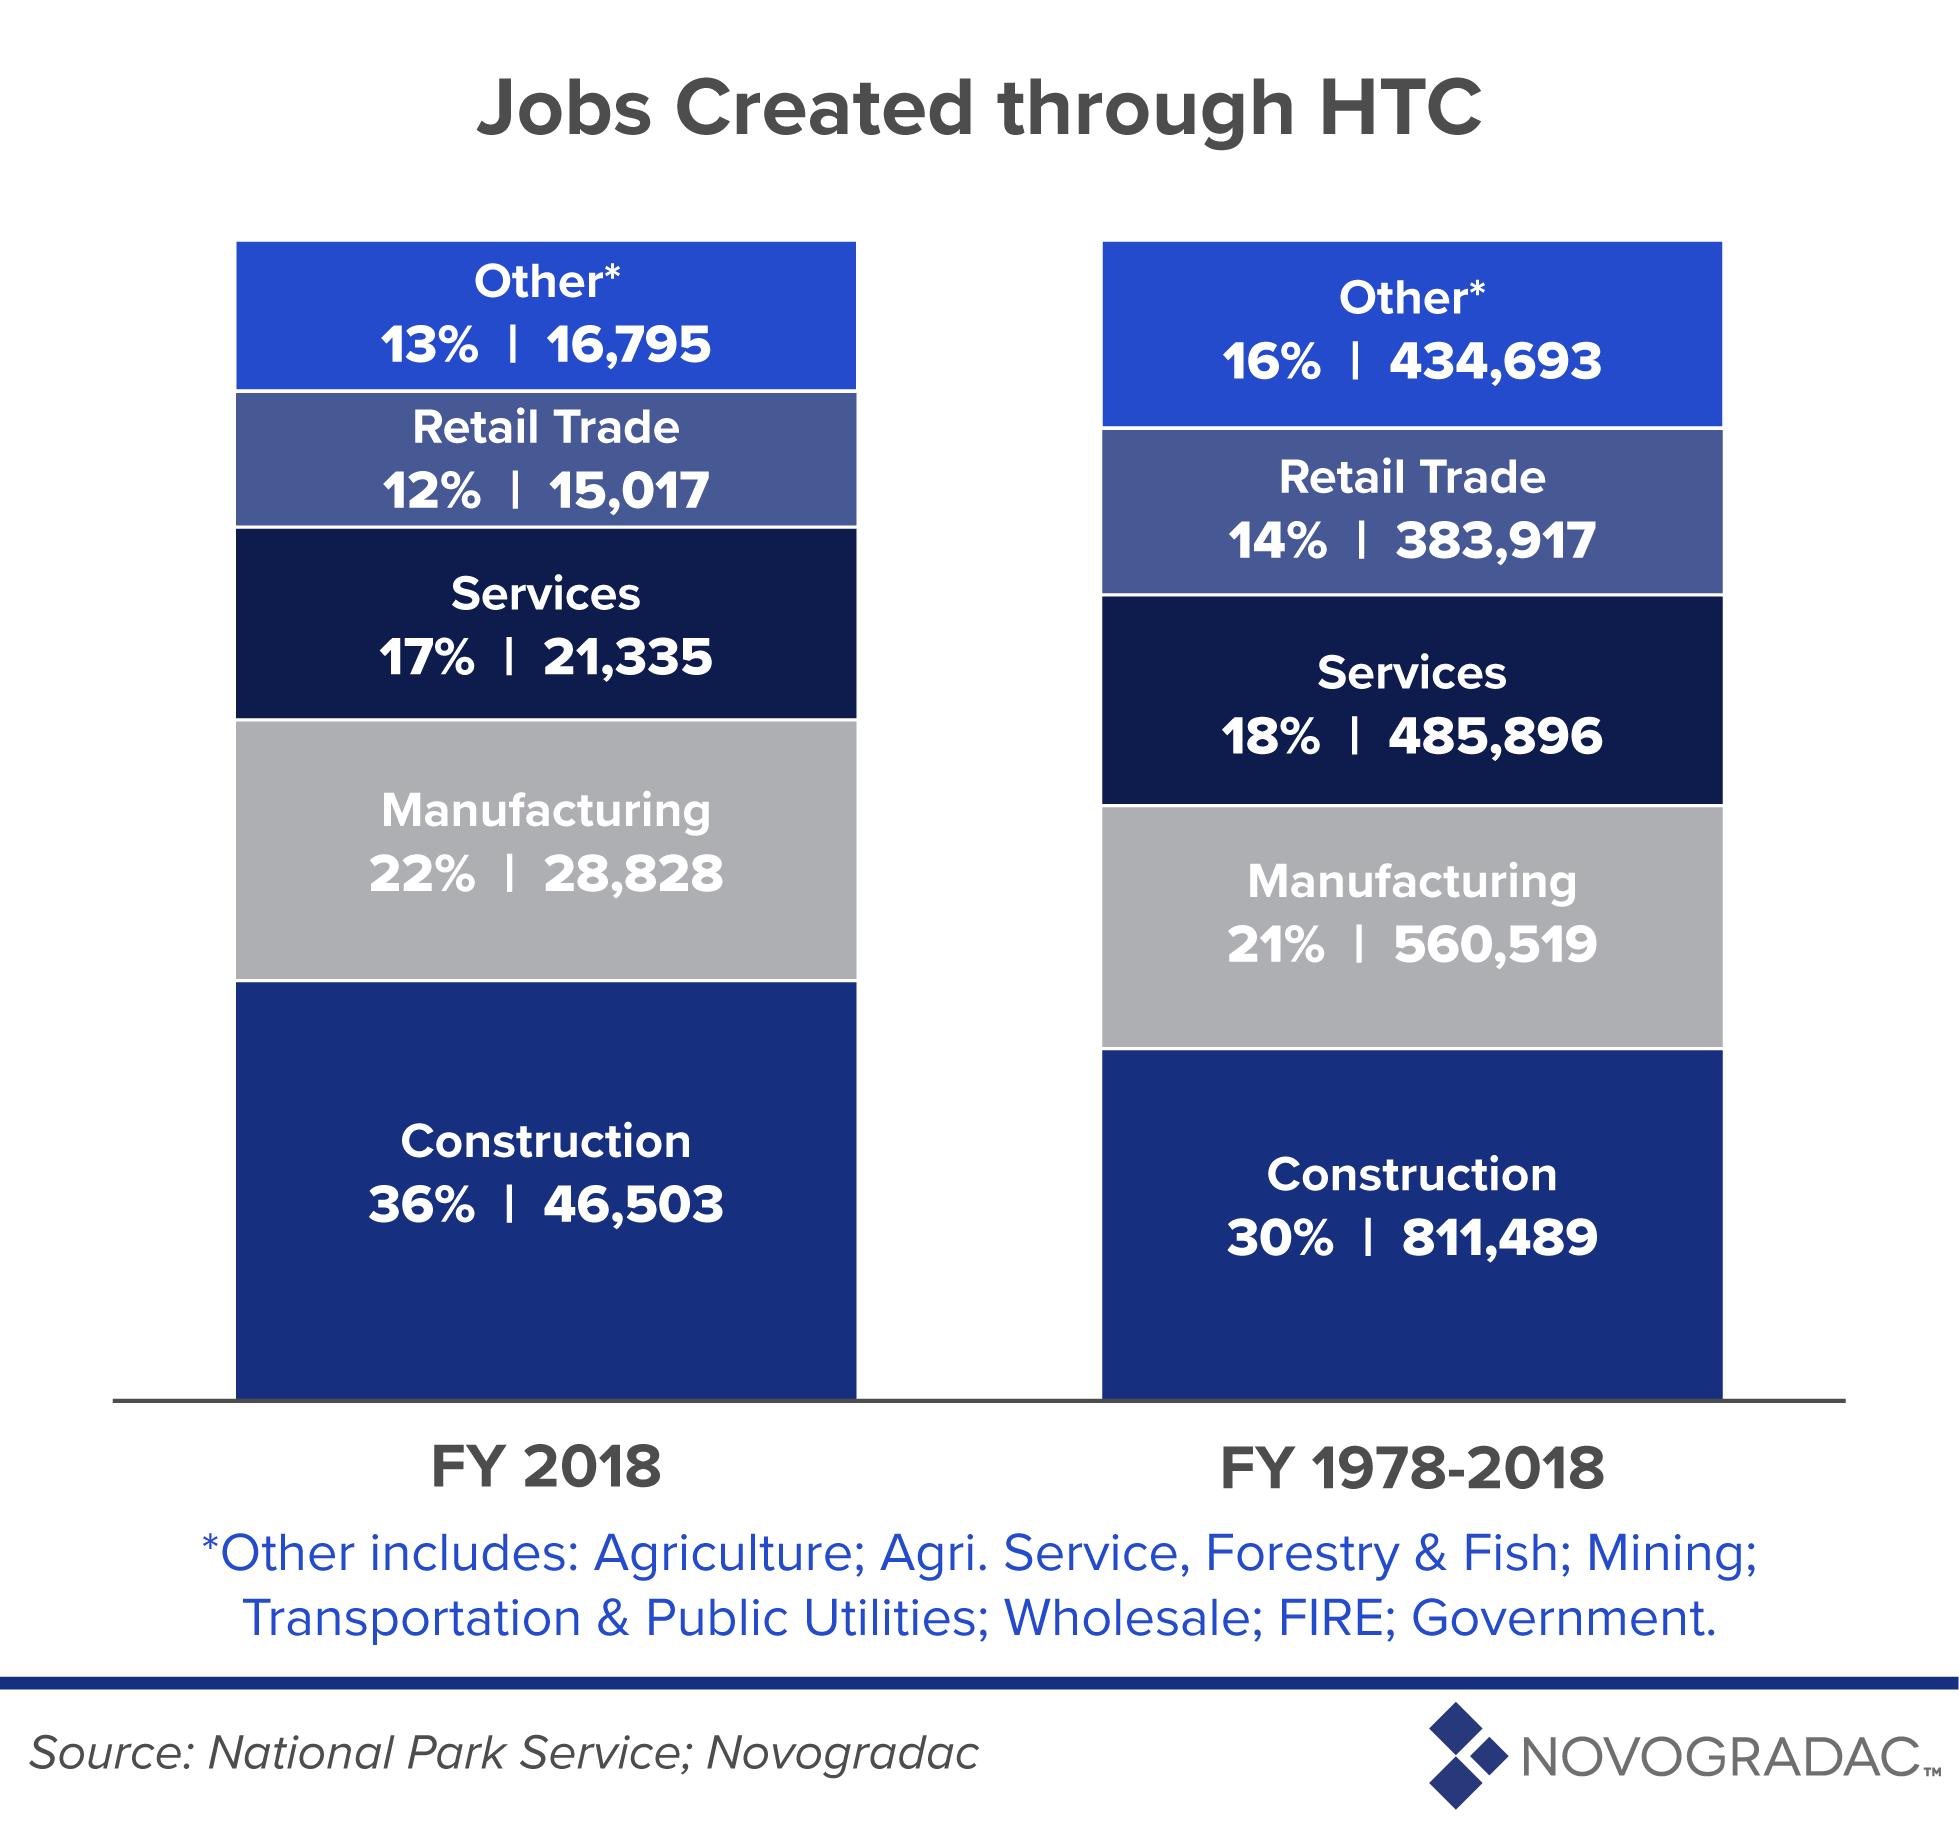 Jobs Created Through HTC Image 1